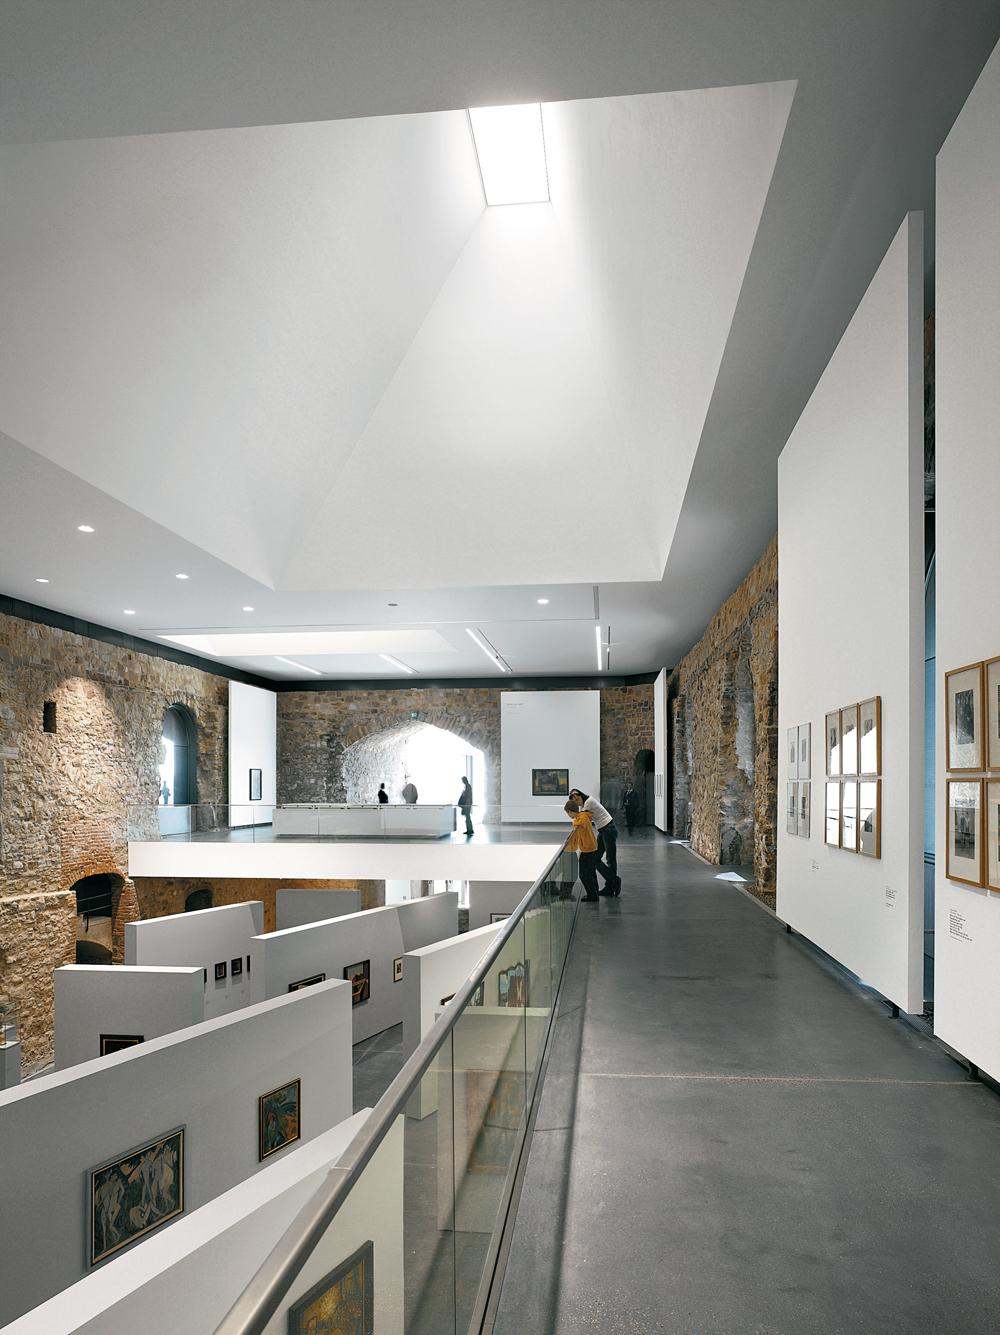 Refurbishment And Extension Of The Art Museum Moritzburg